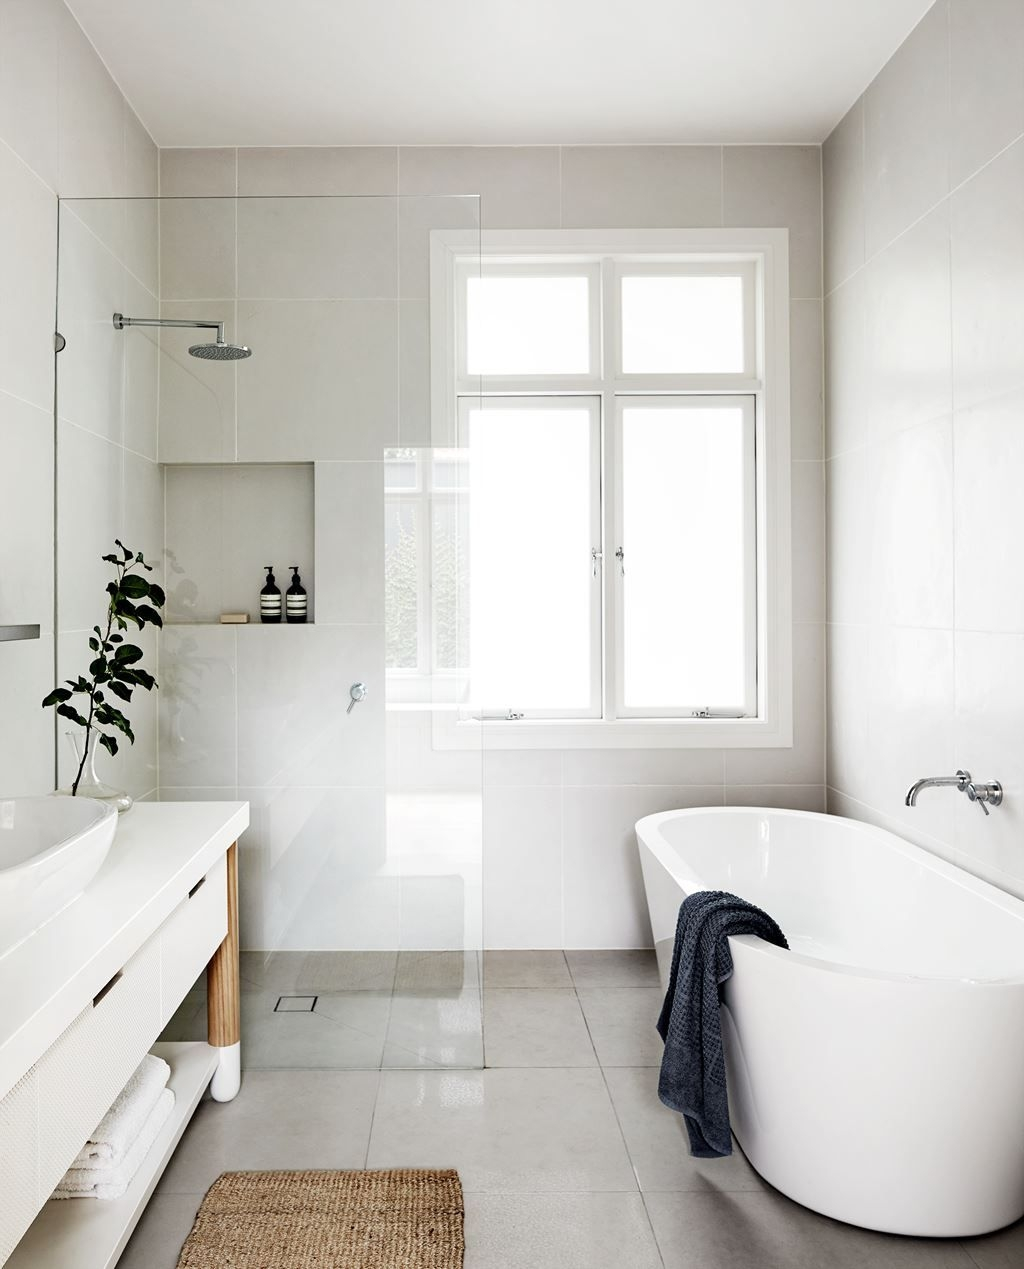 39 Cool And Stylish Small Bathroom Design Ideas01